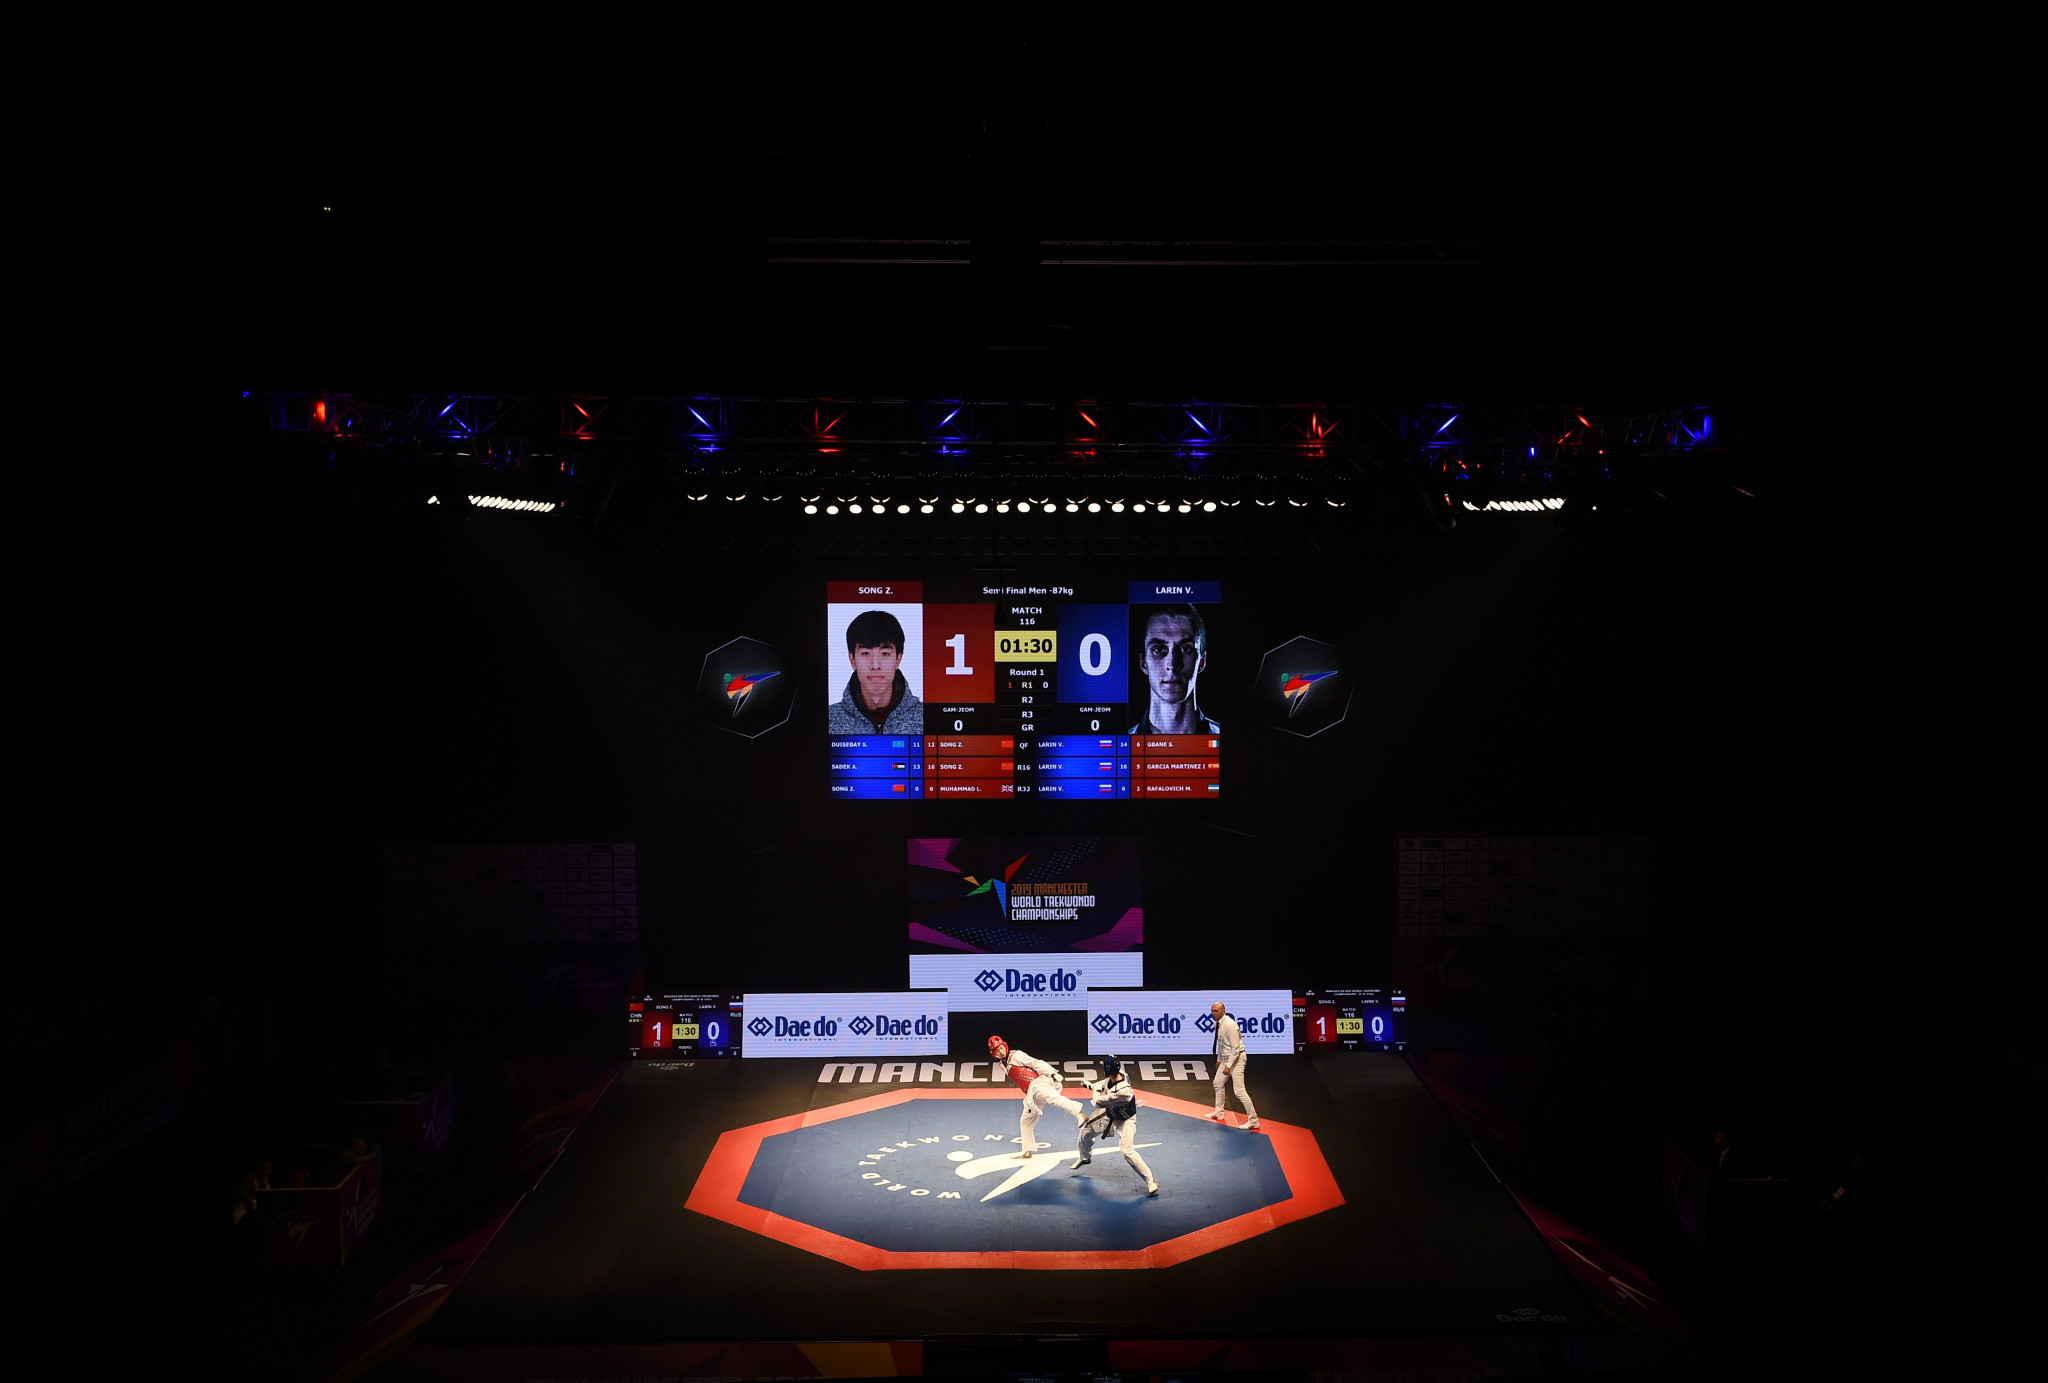 World Taekwondo invites applications for Presidential election